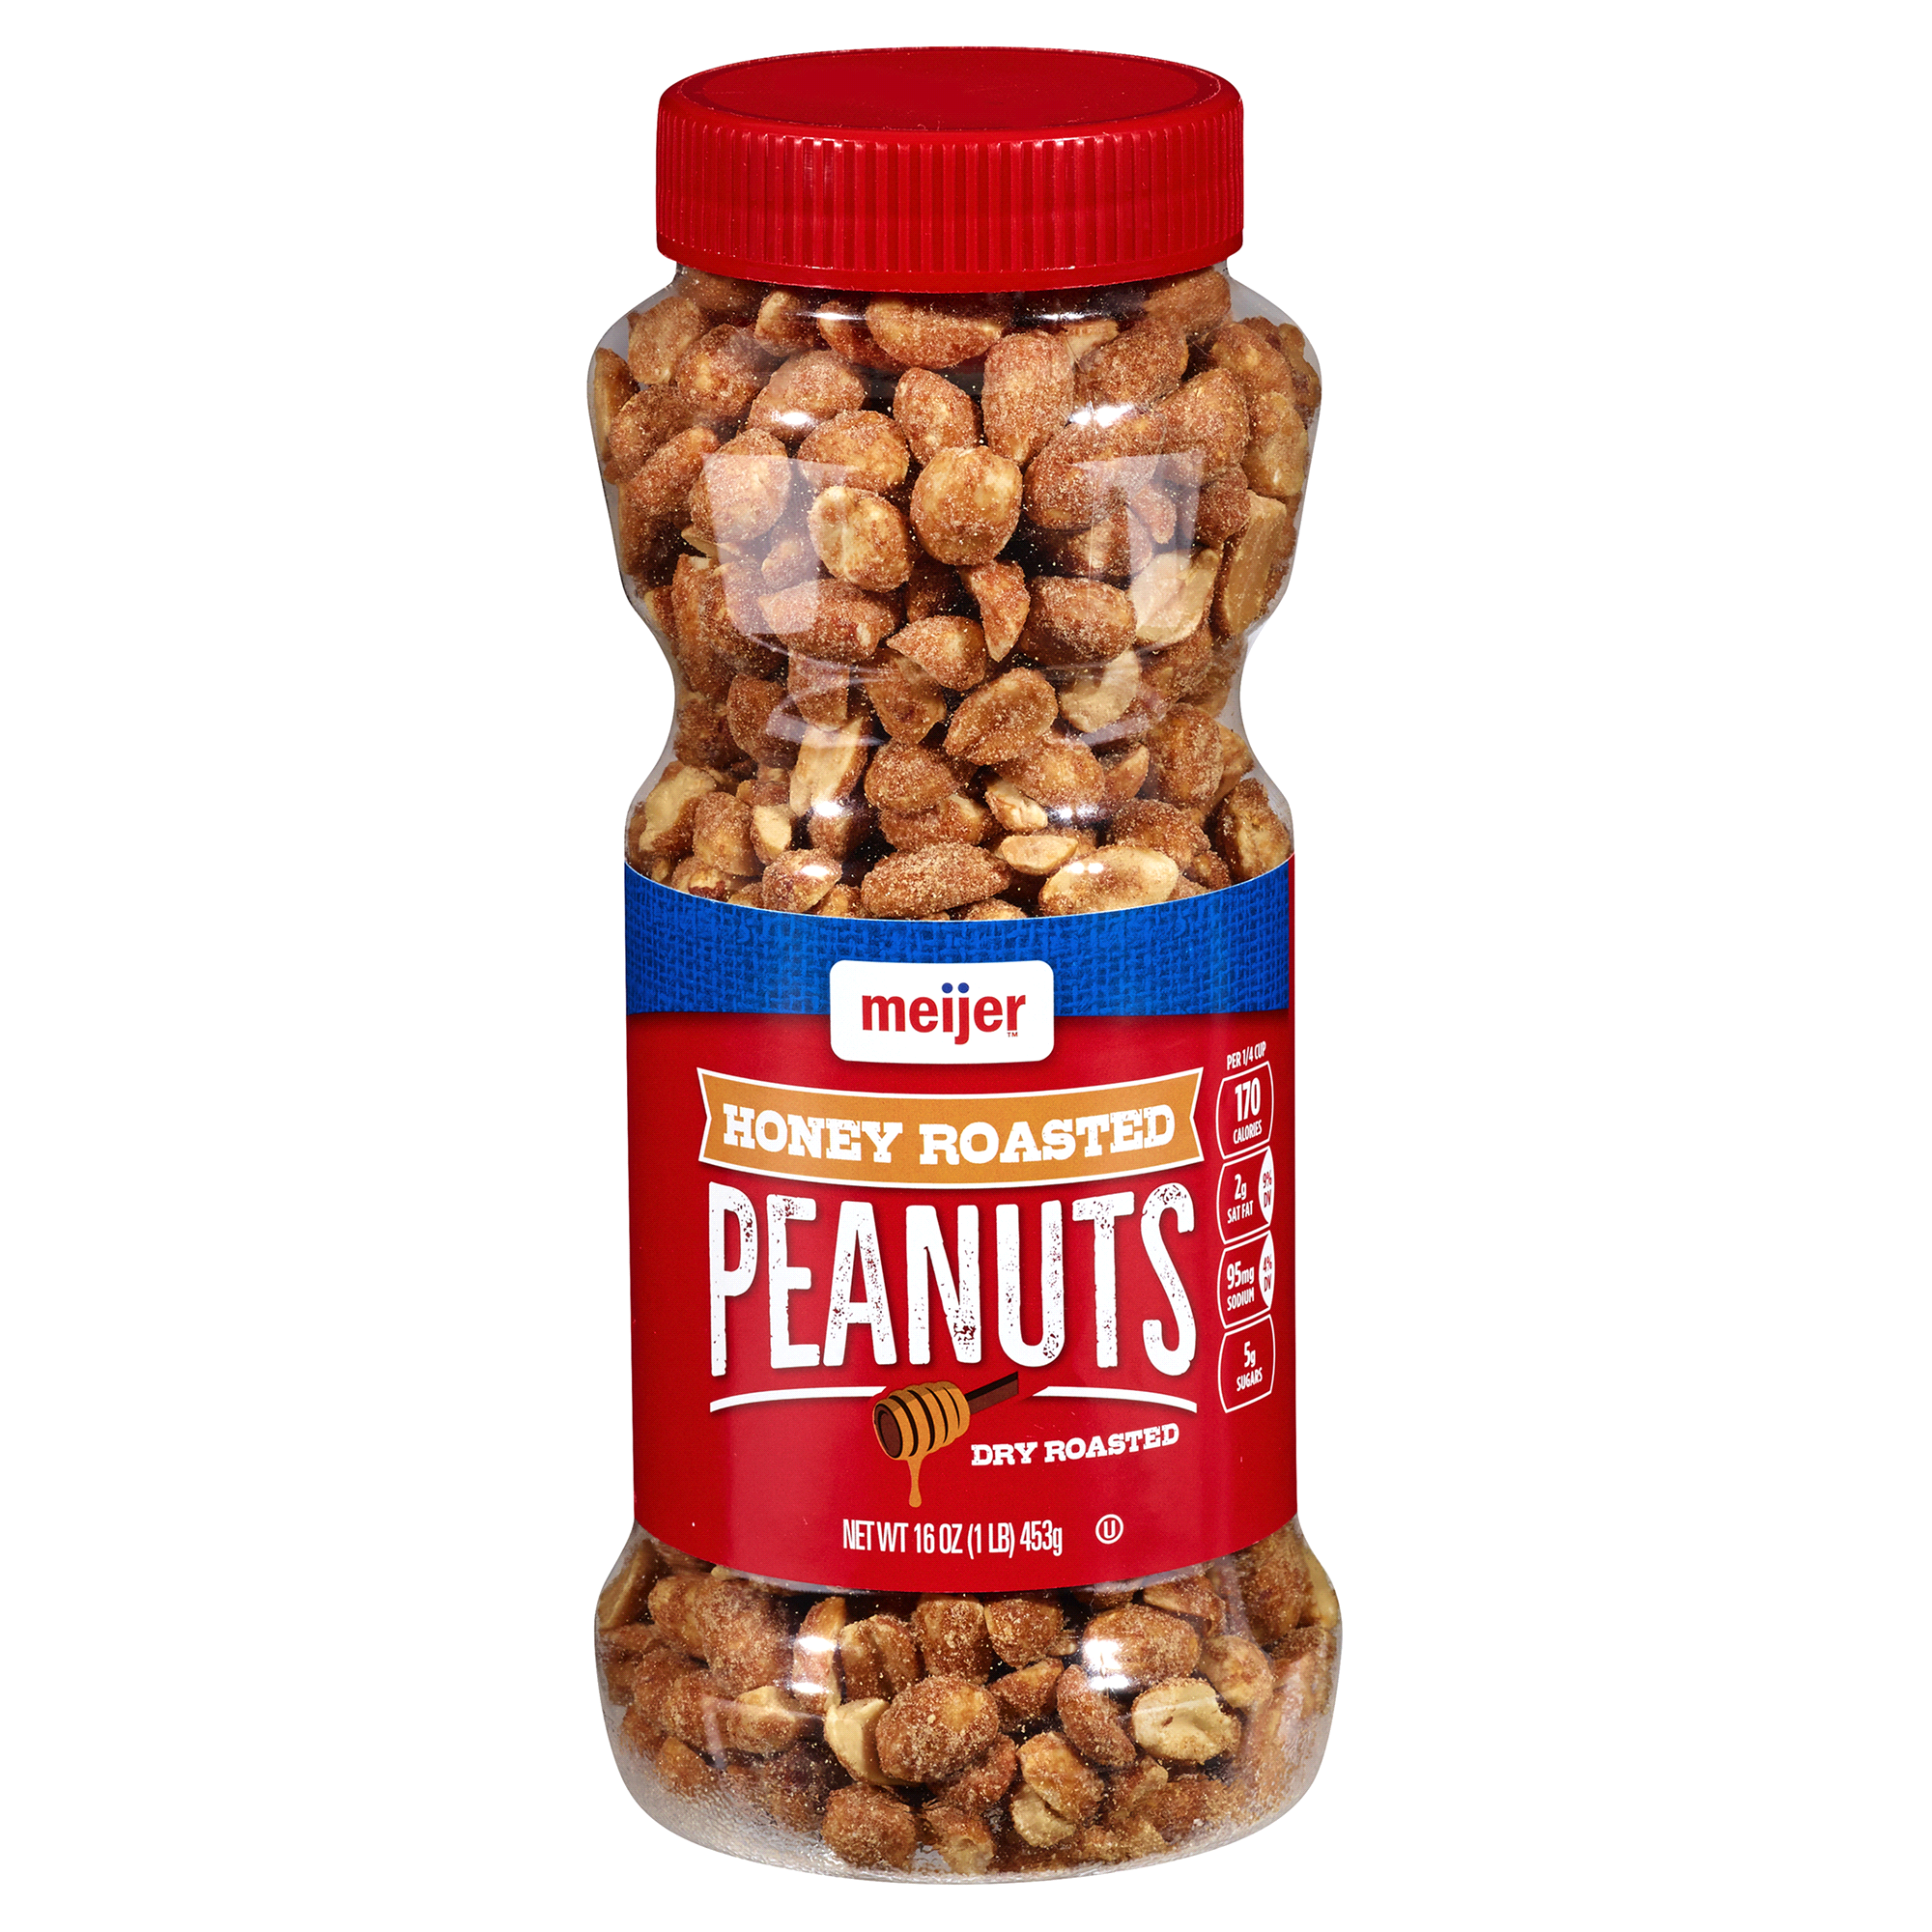 Planters Five Alarm Chili Peanuts